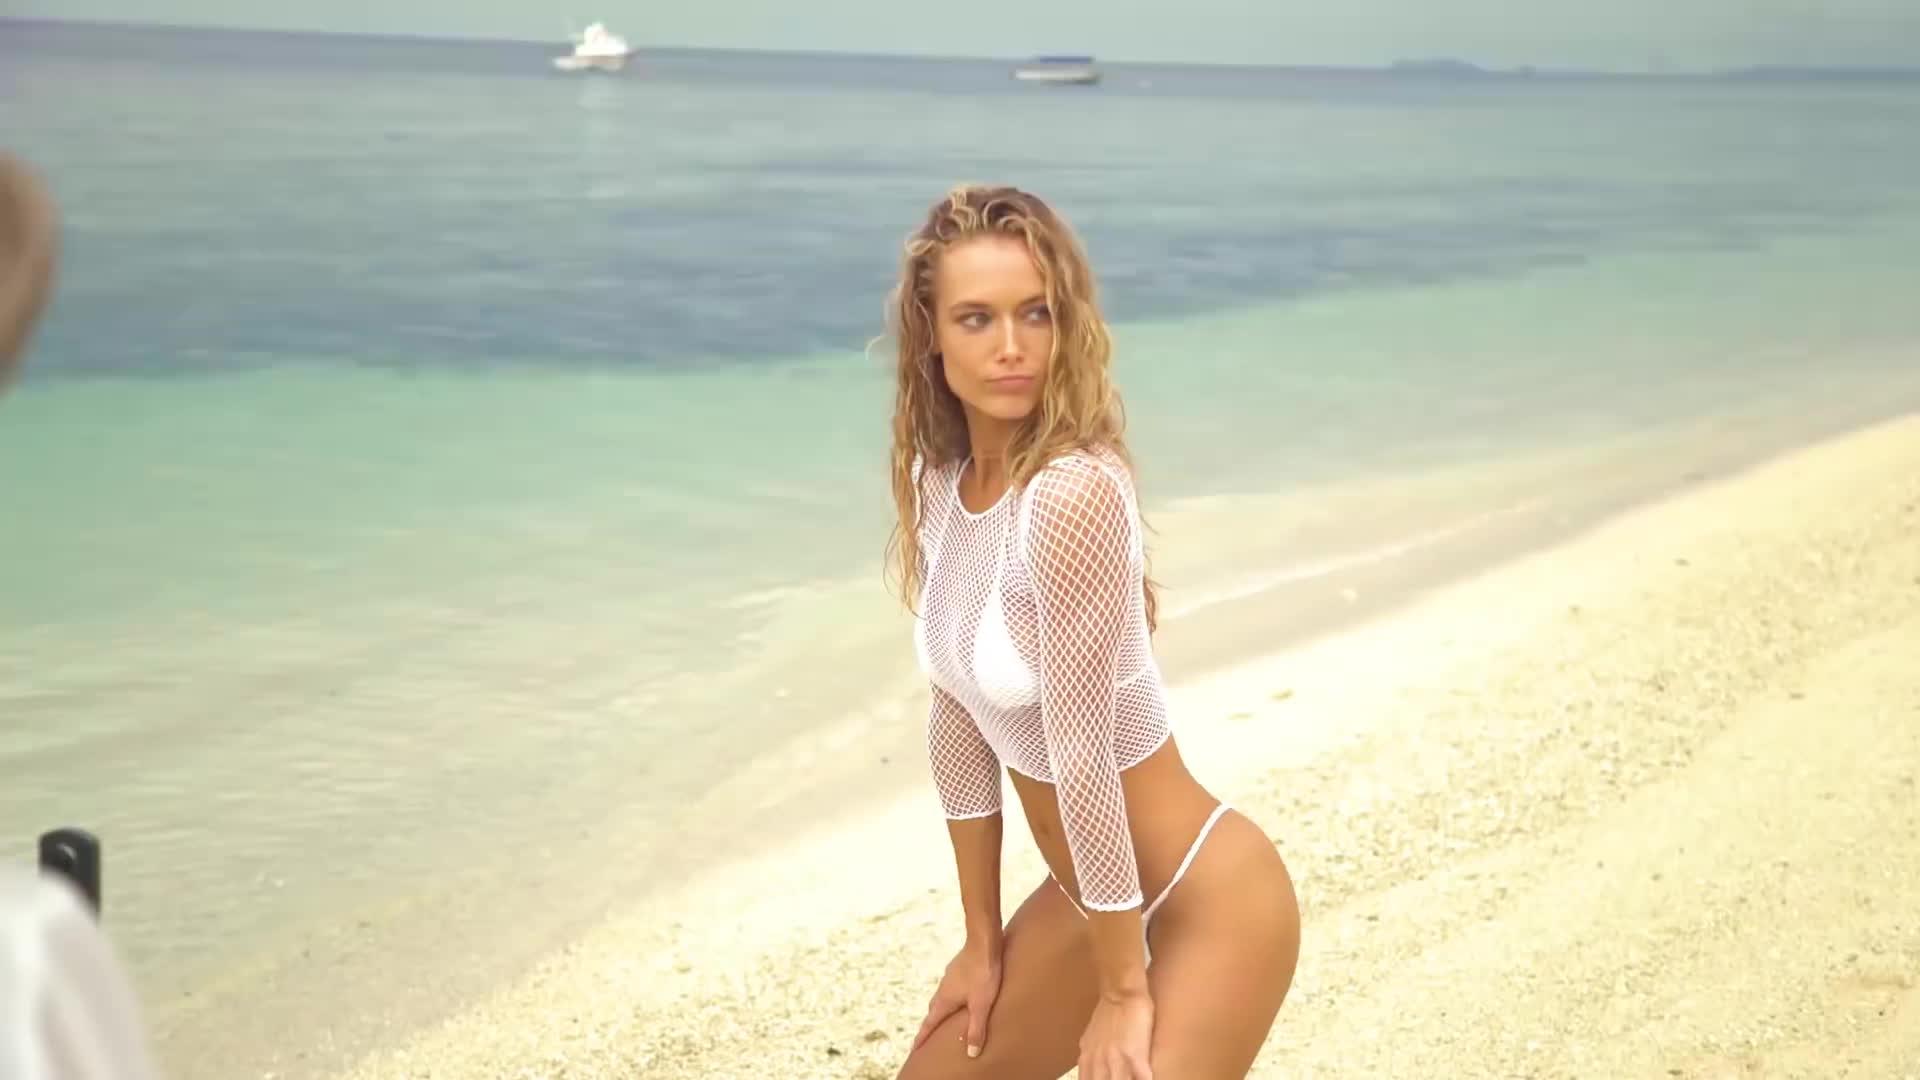 hannah ferguson si swimsuit, hannah ferguson2017, hannahferguson, Hannah Ferguson Twerks For You & Gets Flexible In Fiji | Outtakes | Sports Illustrated Swimsuit GIFs